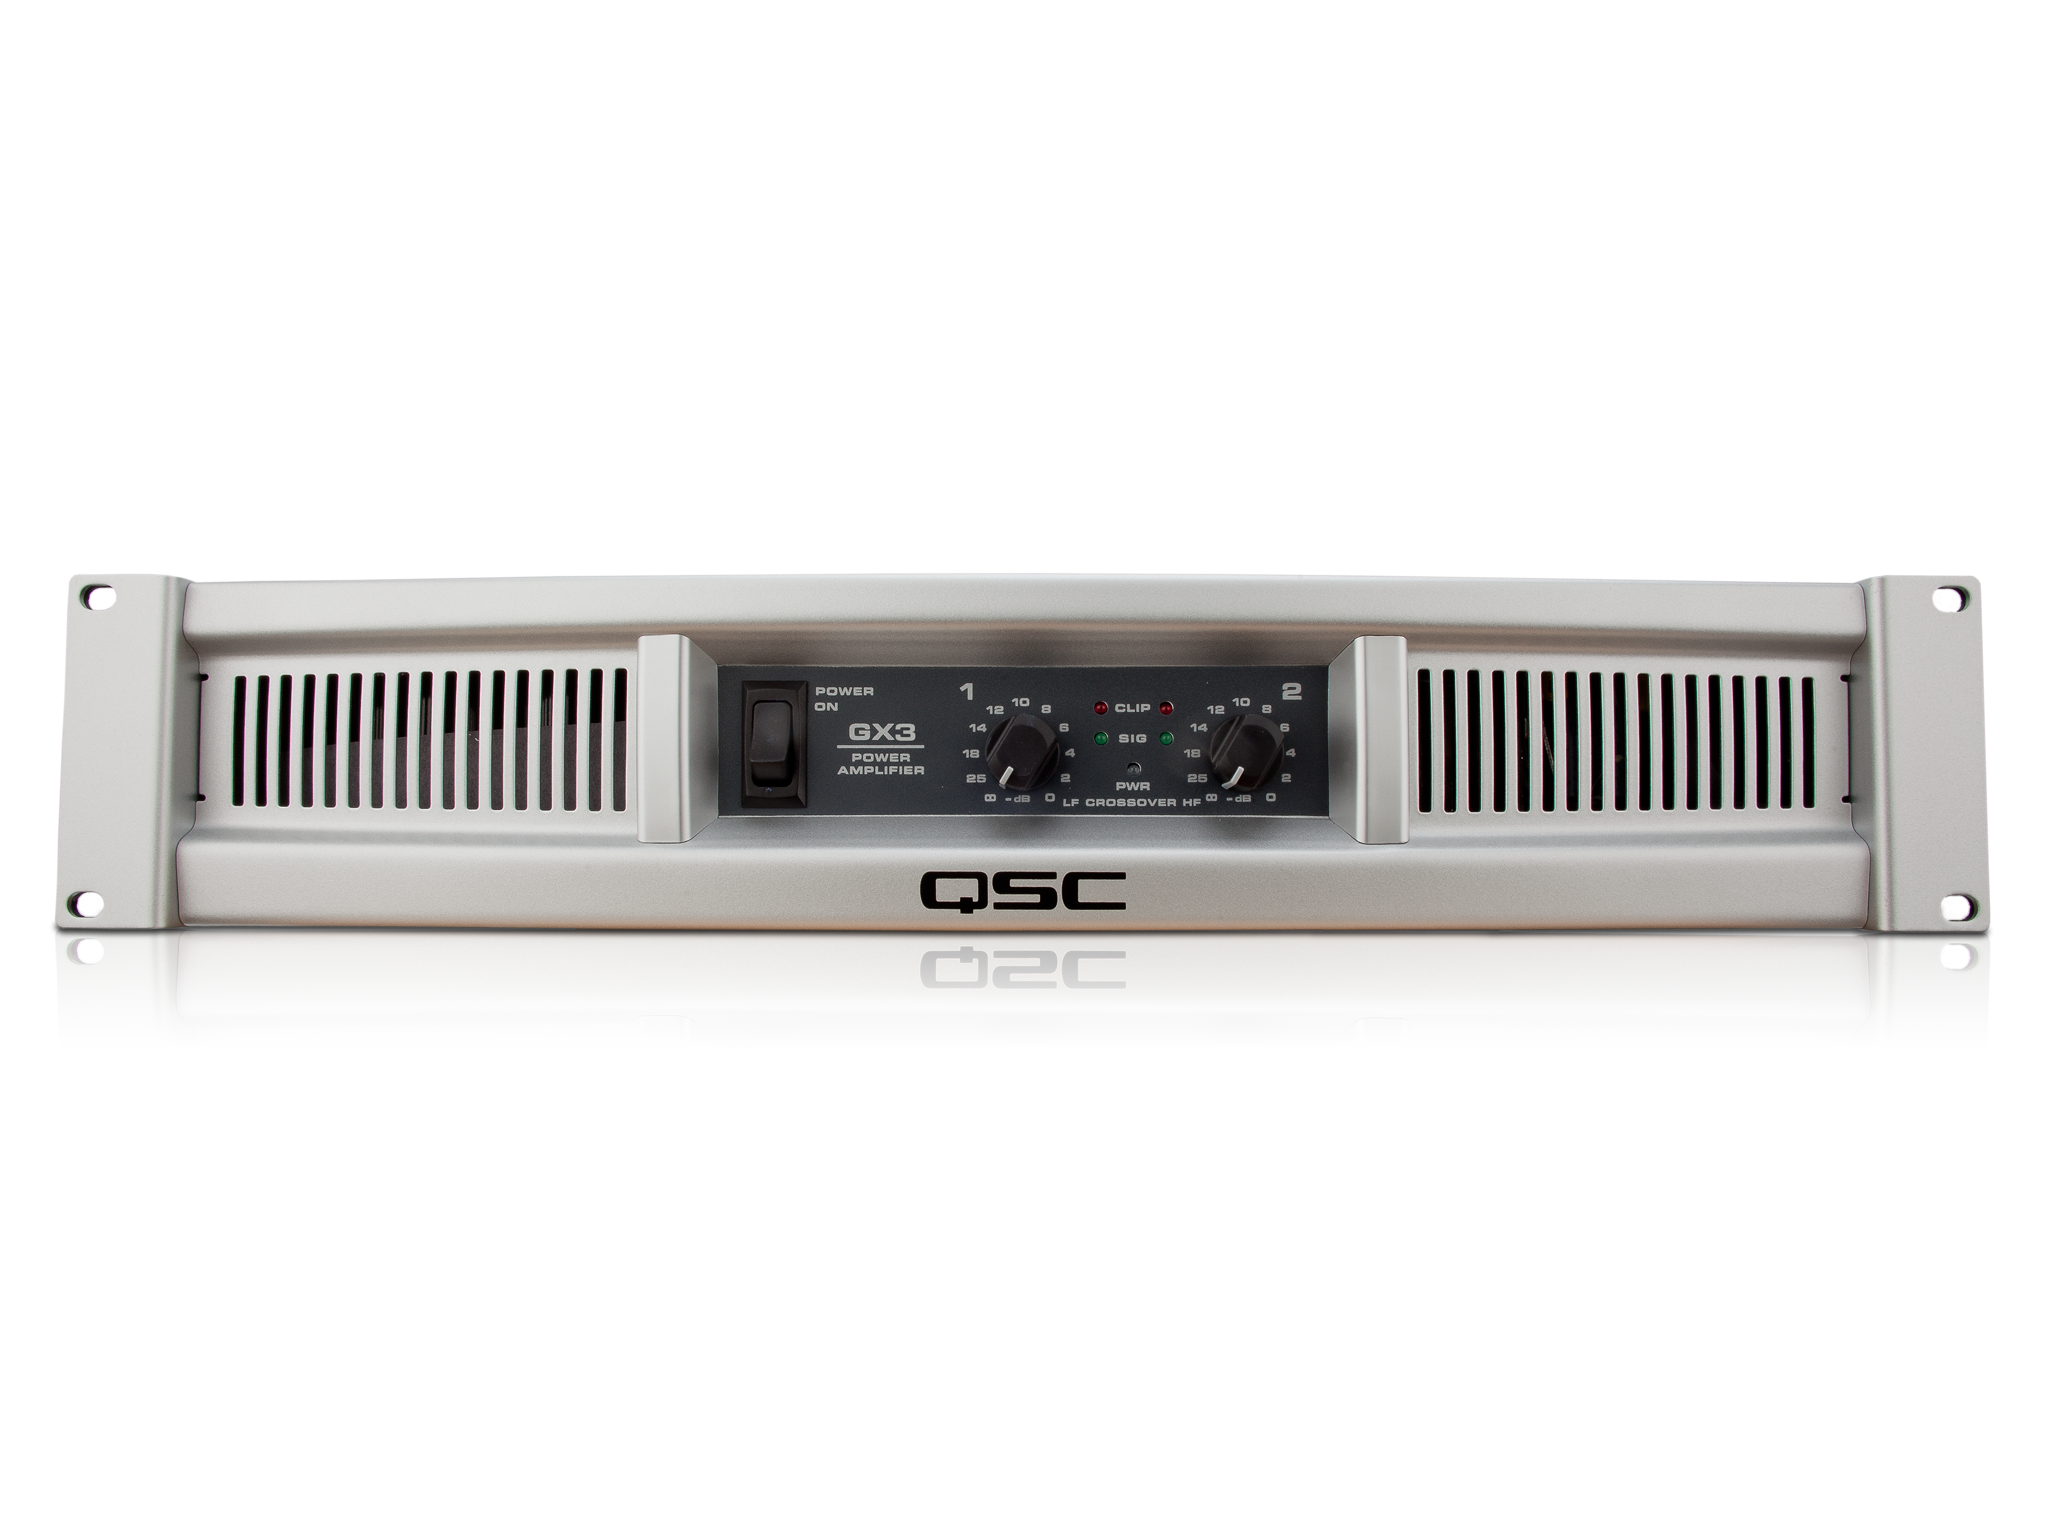 Gx3 Power Amplifier Qsc Combo Xlr Wiring Diagram Front